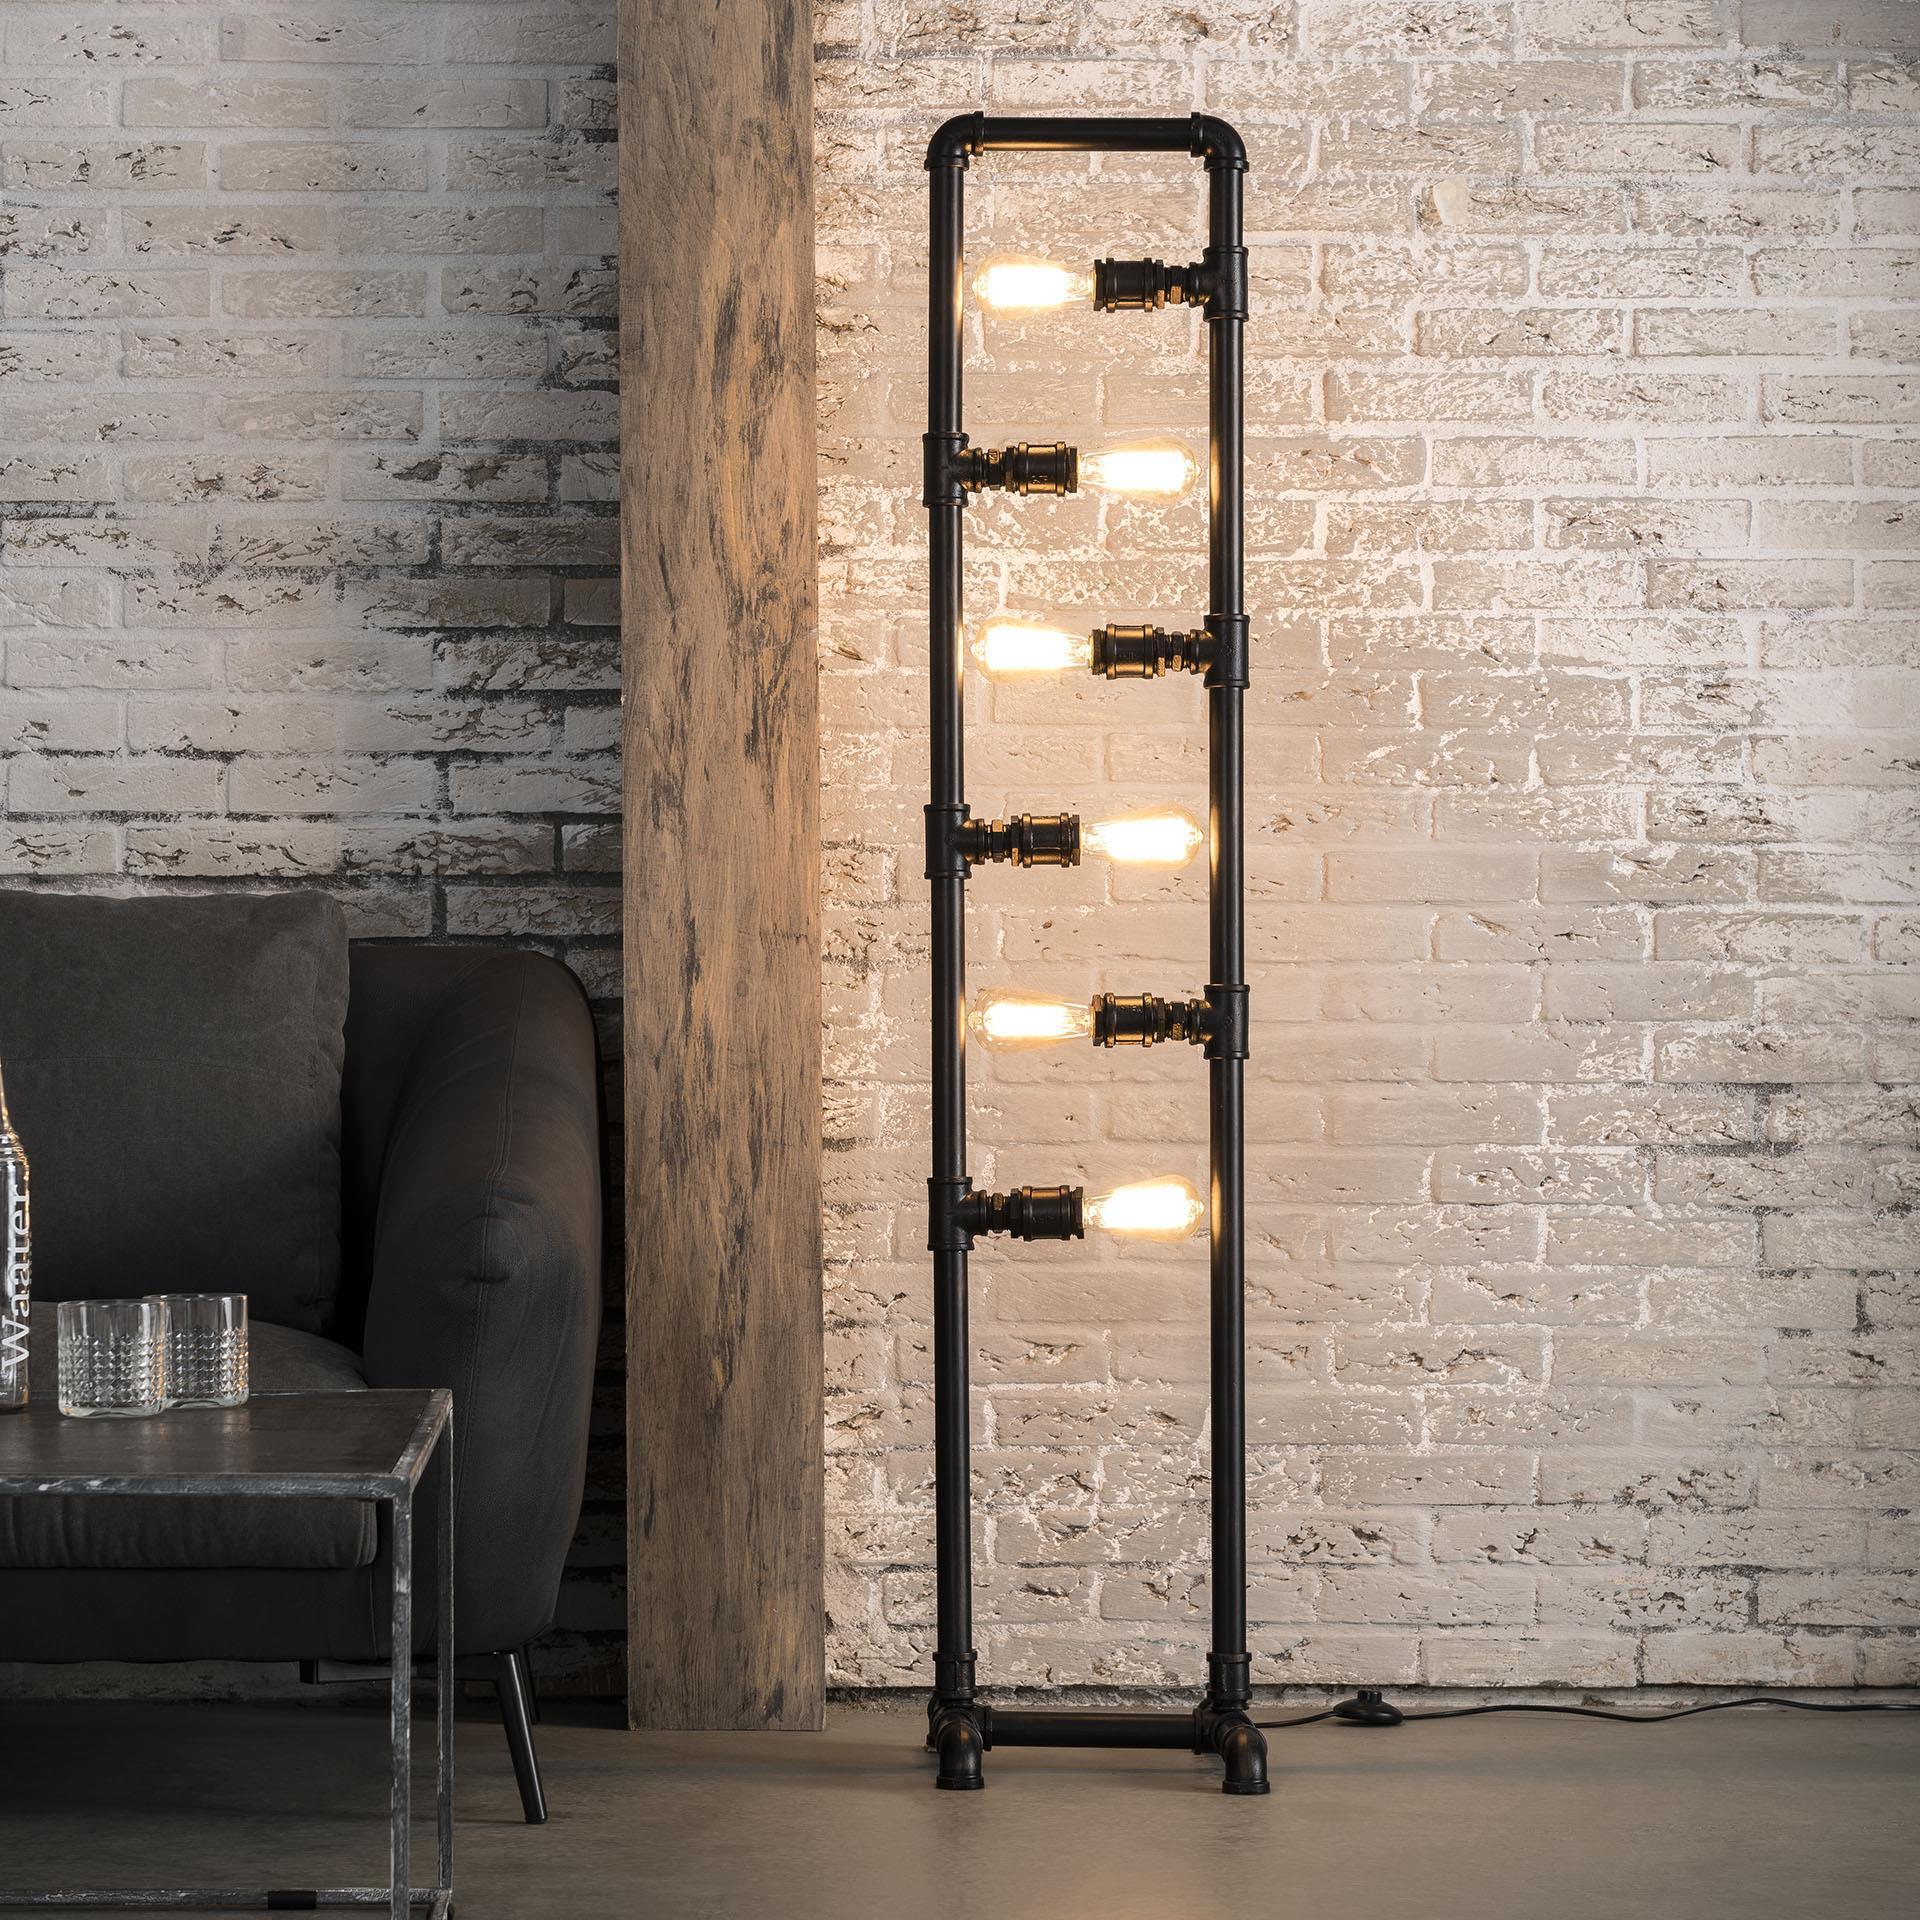 Verlichting   Vloerlampen kopen van LifestyleFurn